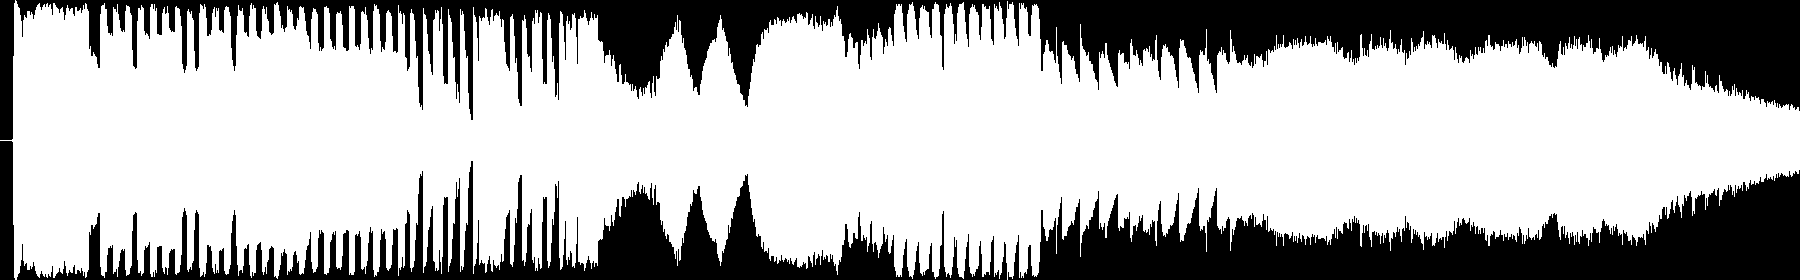 Multiplier audio waveform